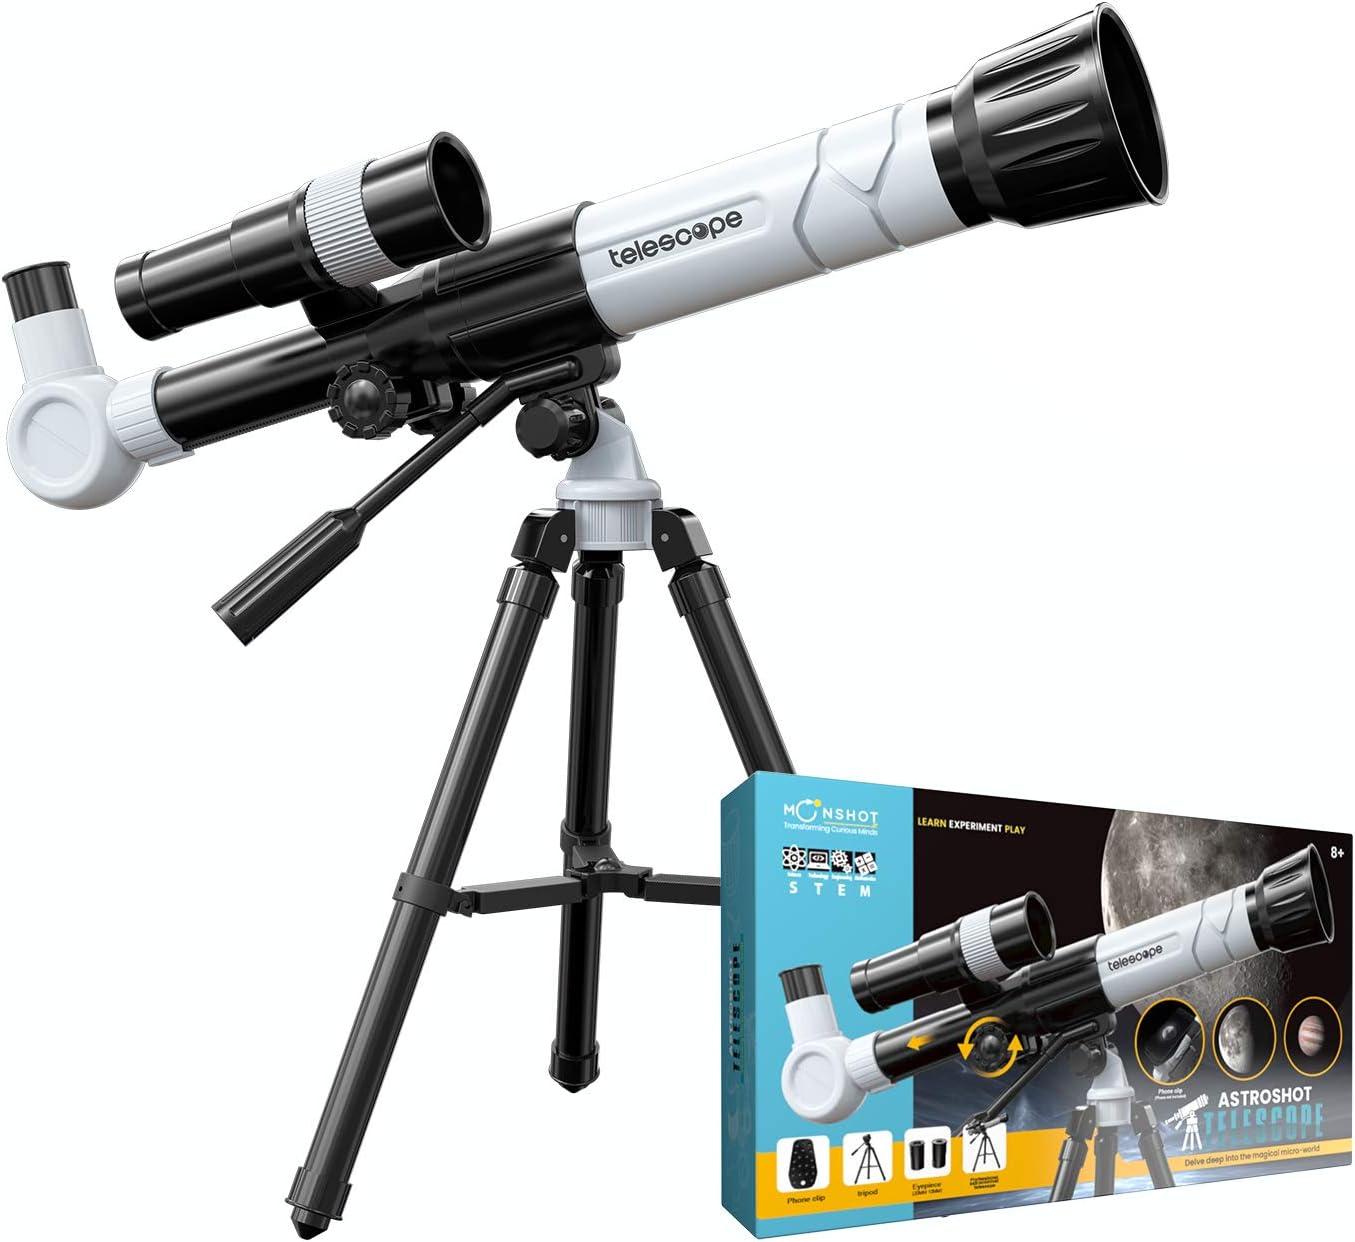 Moonshotjr Astroshot Kids Telescope - Educational Astronomy Toy Telescope, 20X 30X 40X Magnification, Finderscope, Tripod, Objective Lens, Mobile Holder   Beginners Travel Space Telescope (Off White)